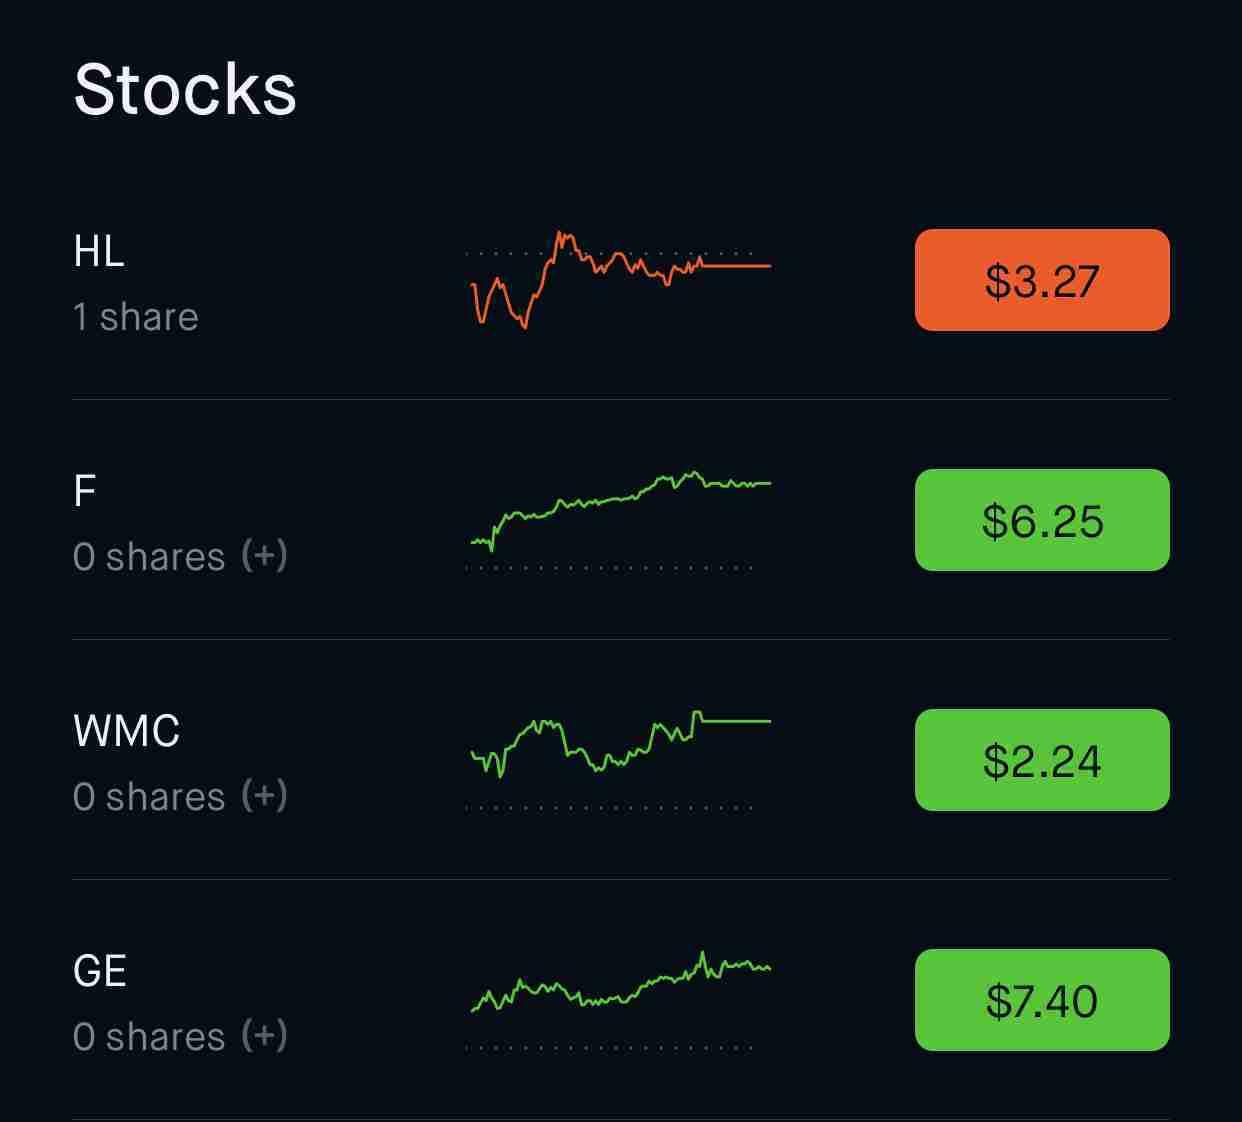 Ford stock, WMC stock, GE stock, stock market